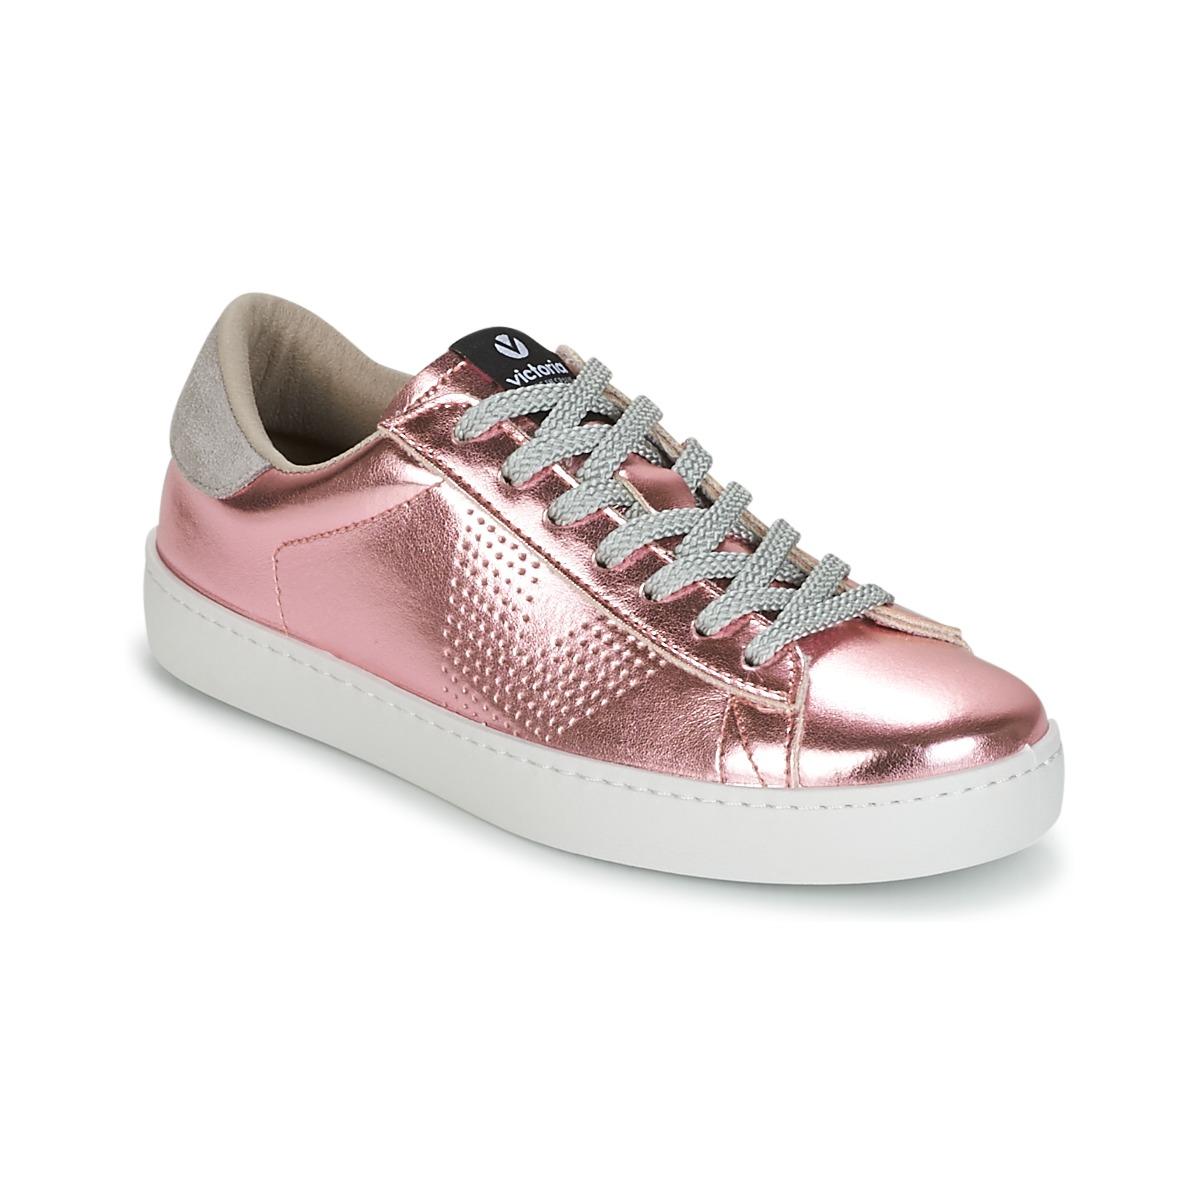 Victoria DEPORTIVO METALIZADO Rose - Kostenloser Versand bei Spartoode ! - Schuhe Sneaker Low Damen 27,60 €